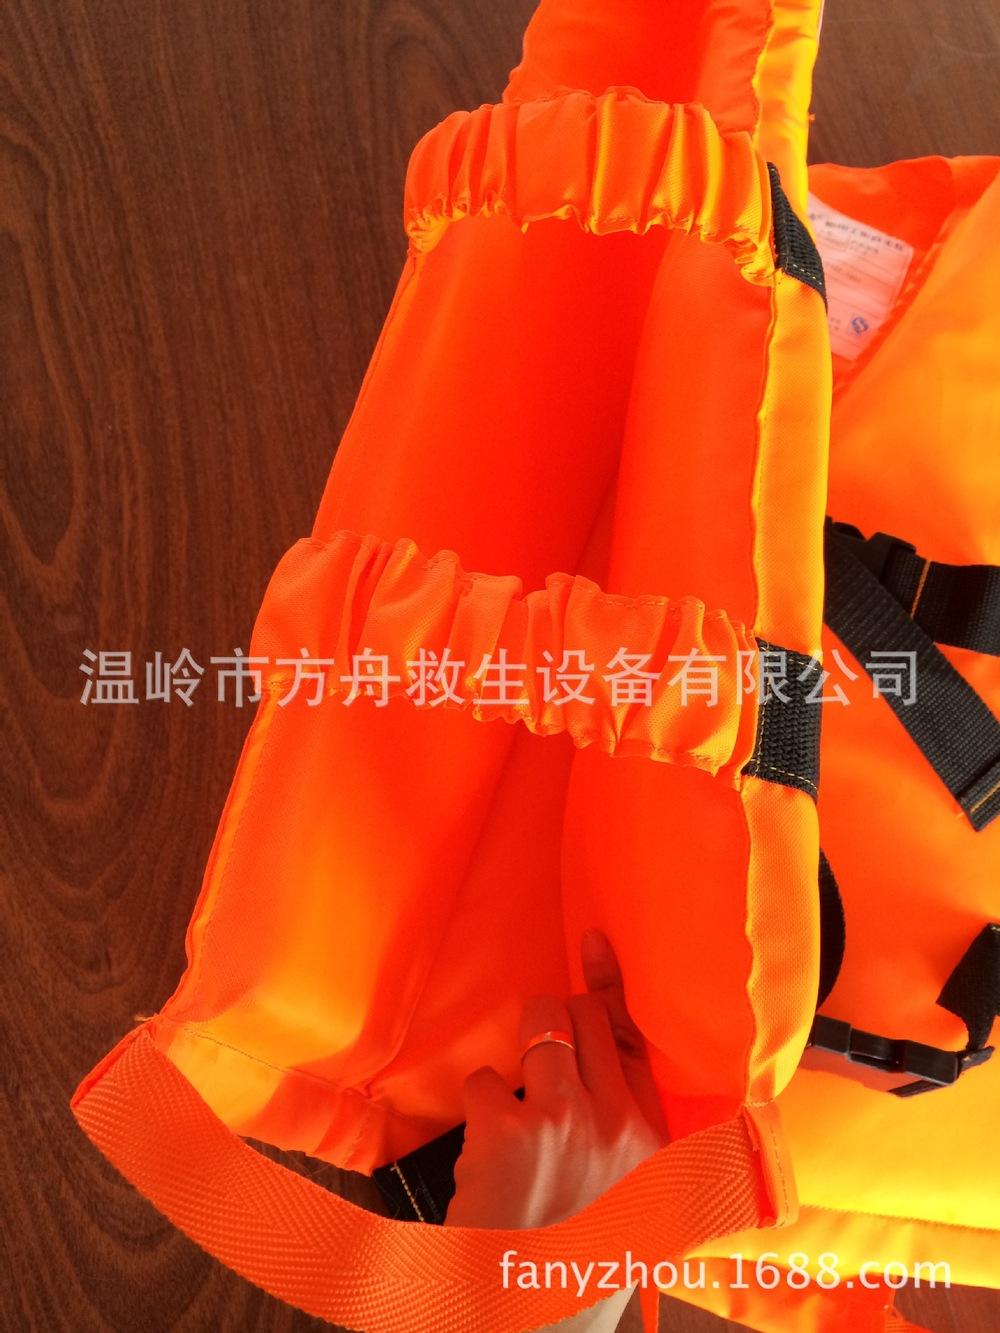 Marine survival suit vest orange lifejackets work with waist elastic tether whistle Ark(China (Mainland))